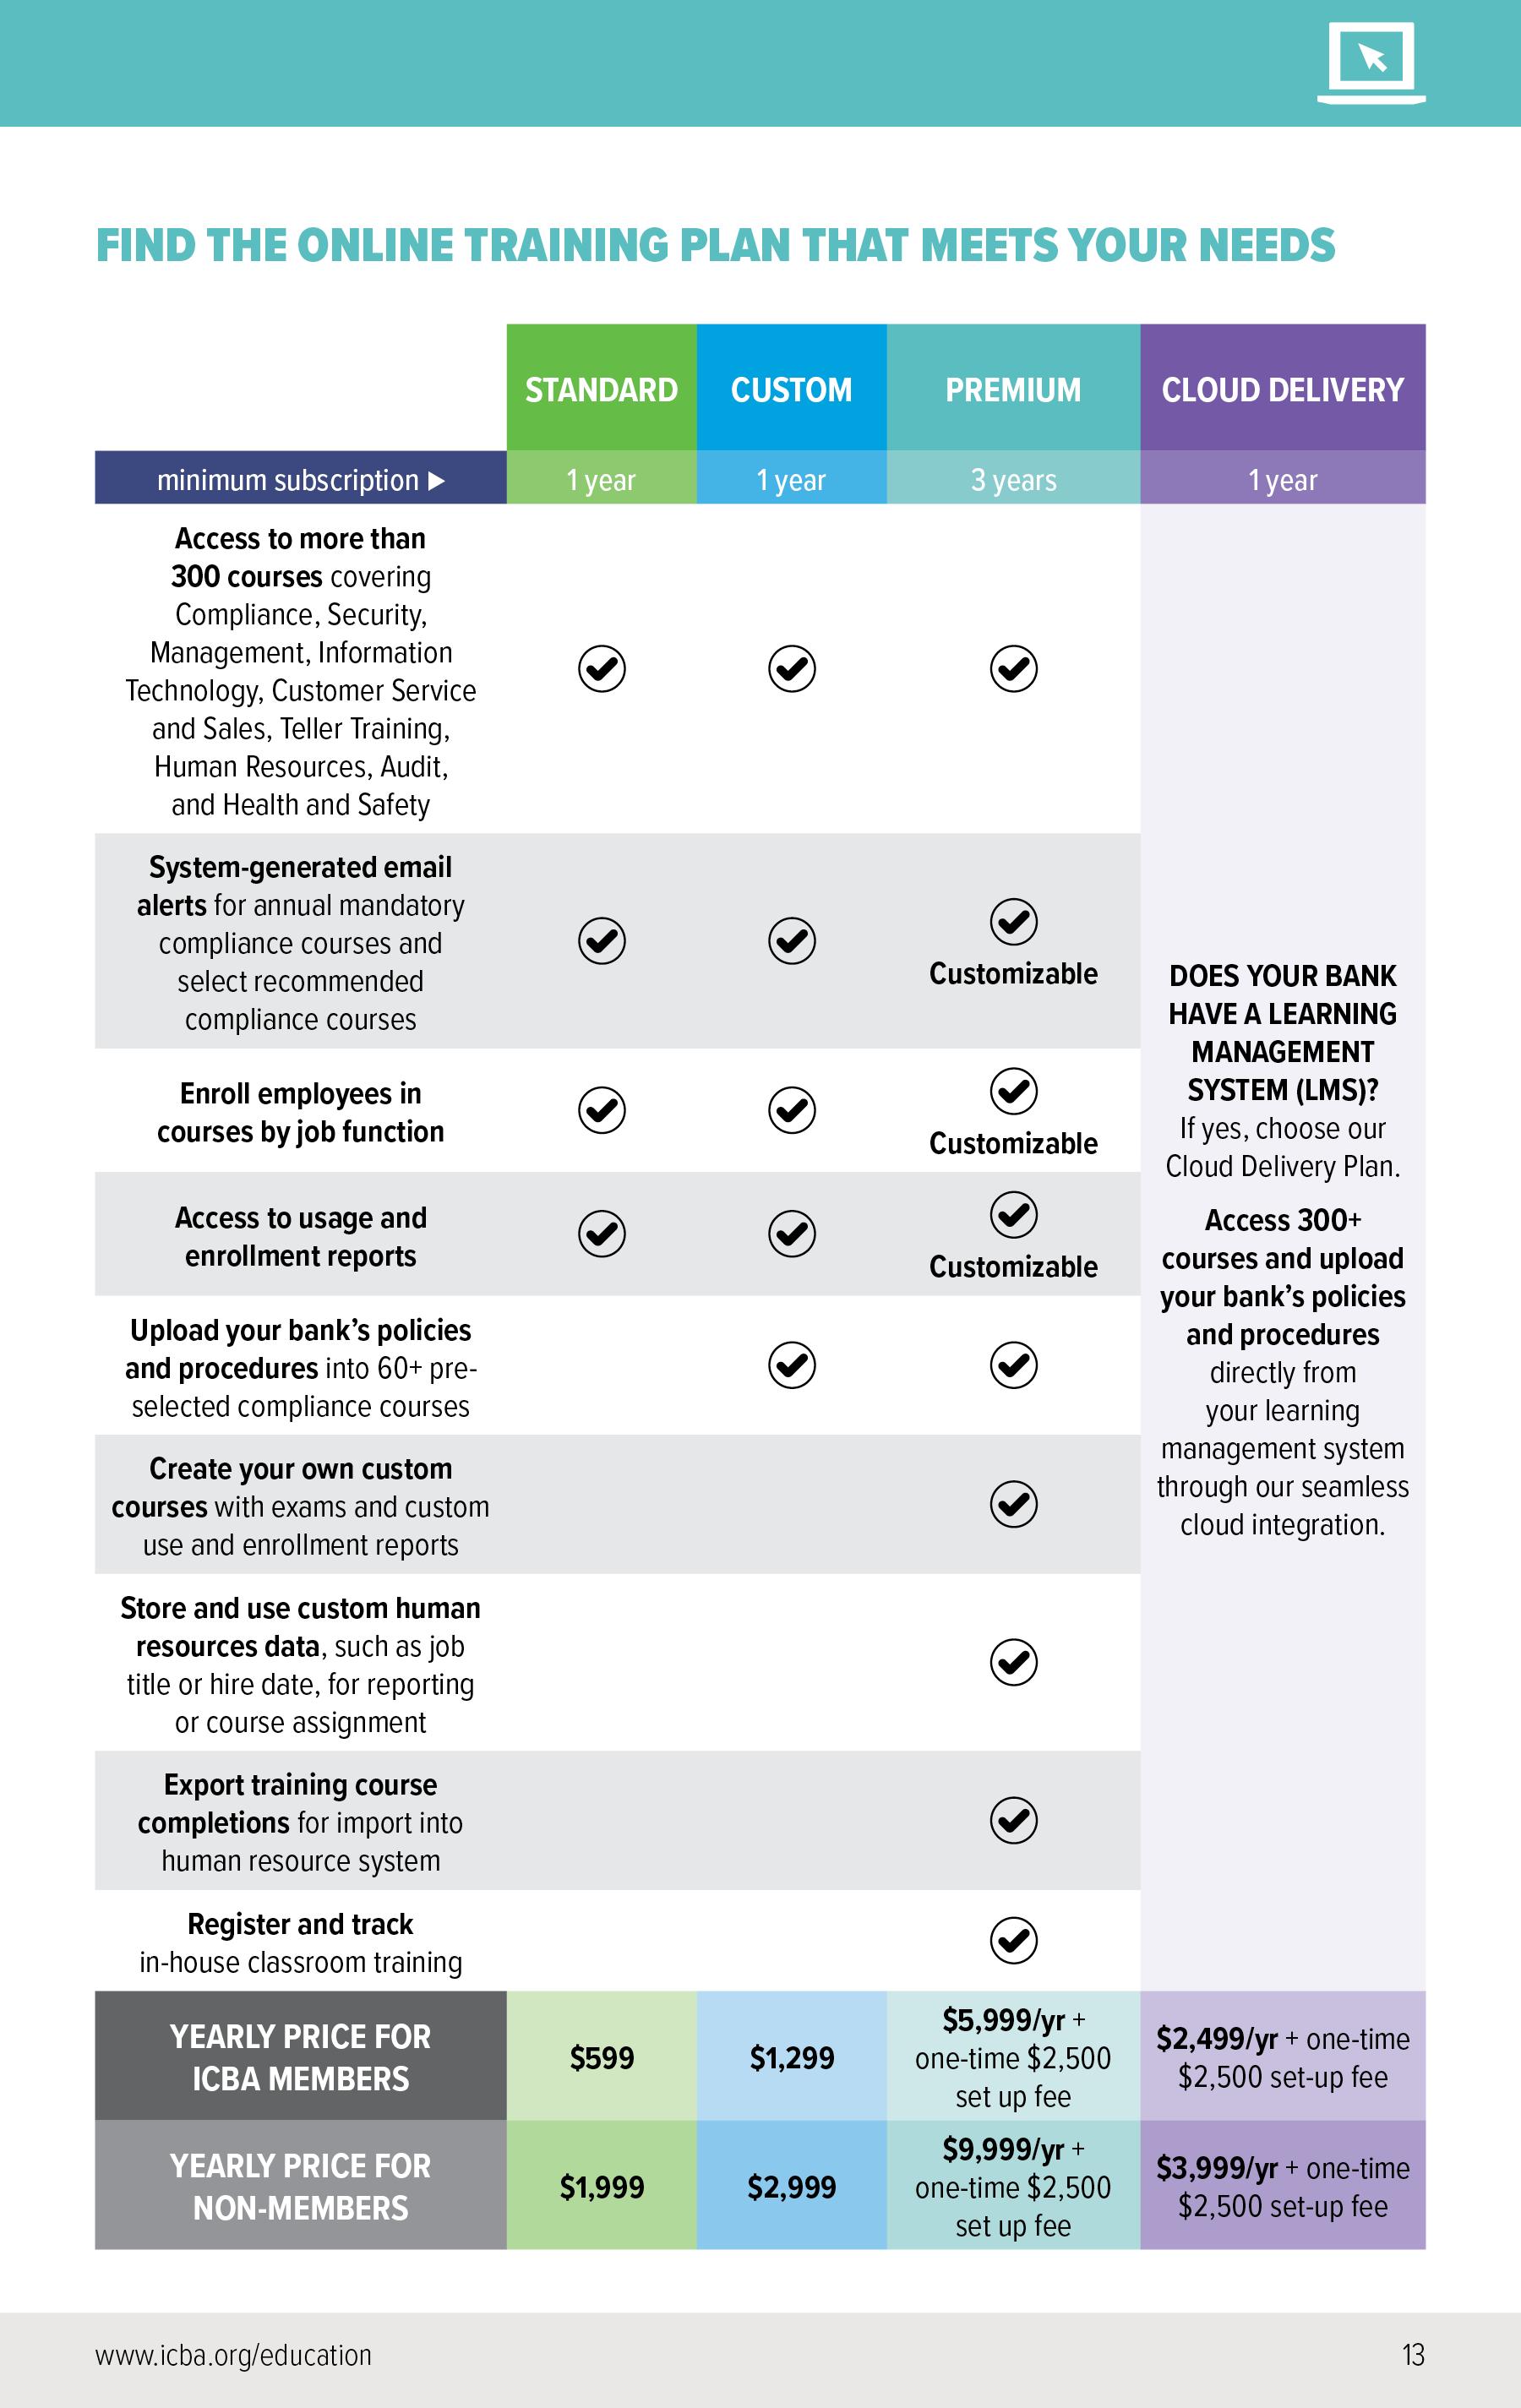 icba training courses